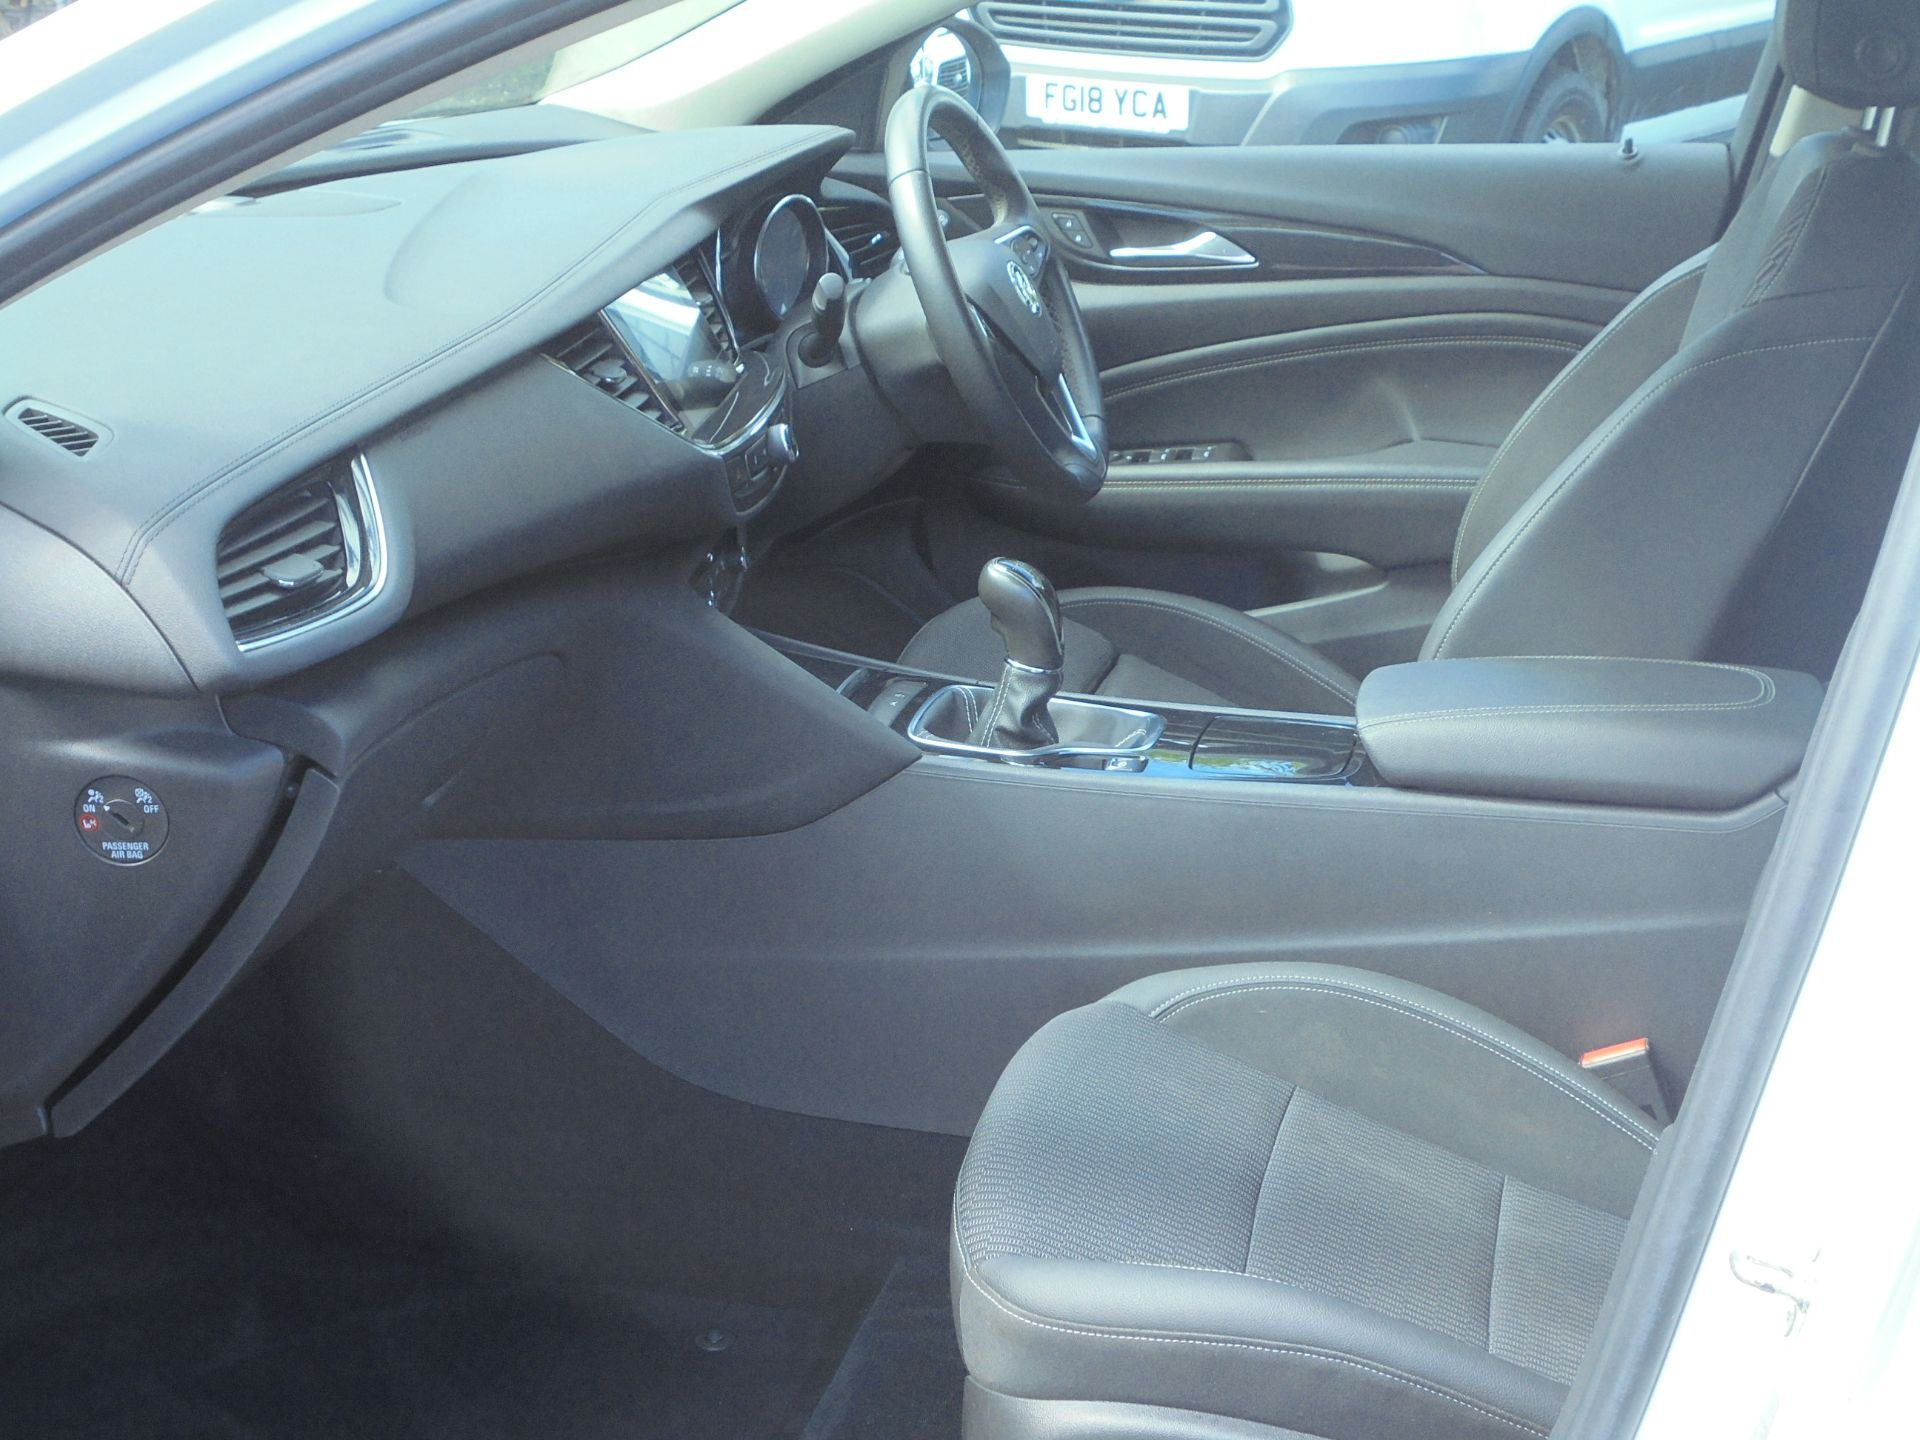 2018 Vauxhall Insignia Grand Sport 1.6 Turbo D Ecotec [136] Sri Nav 5Dr (VU18DFF) Image 5